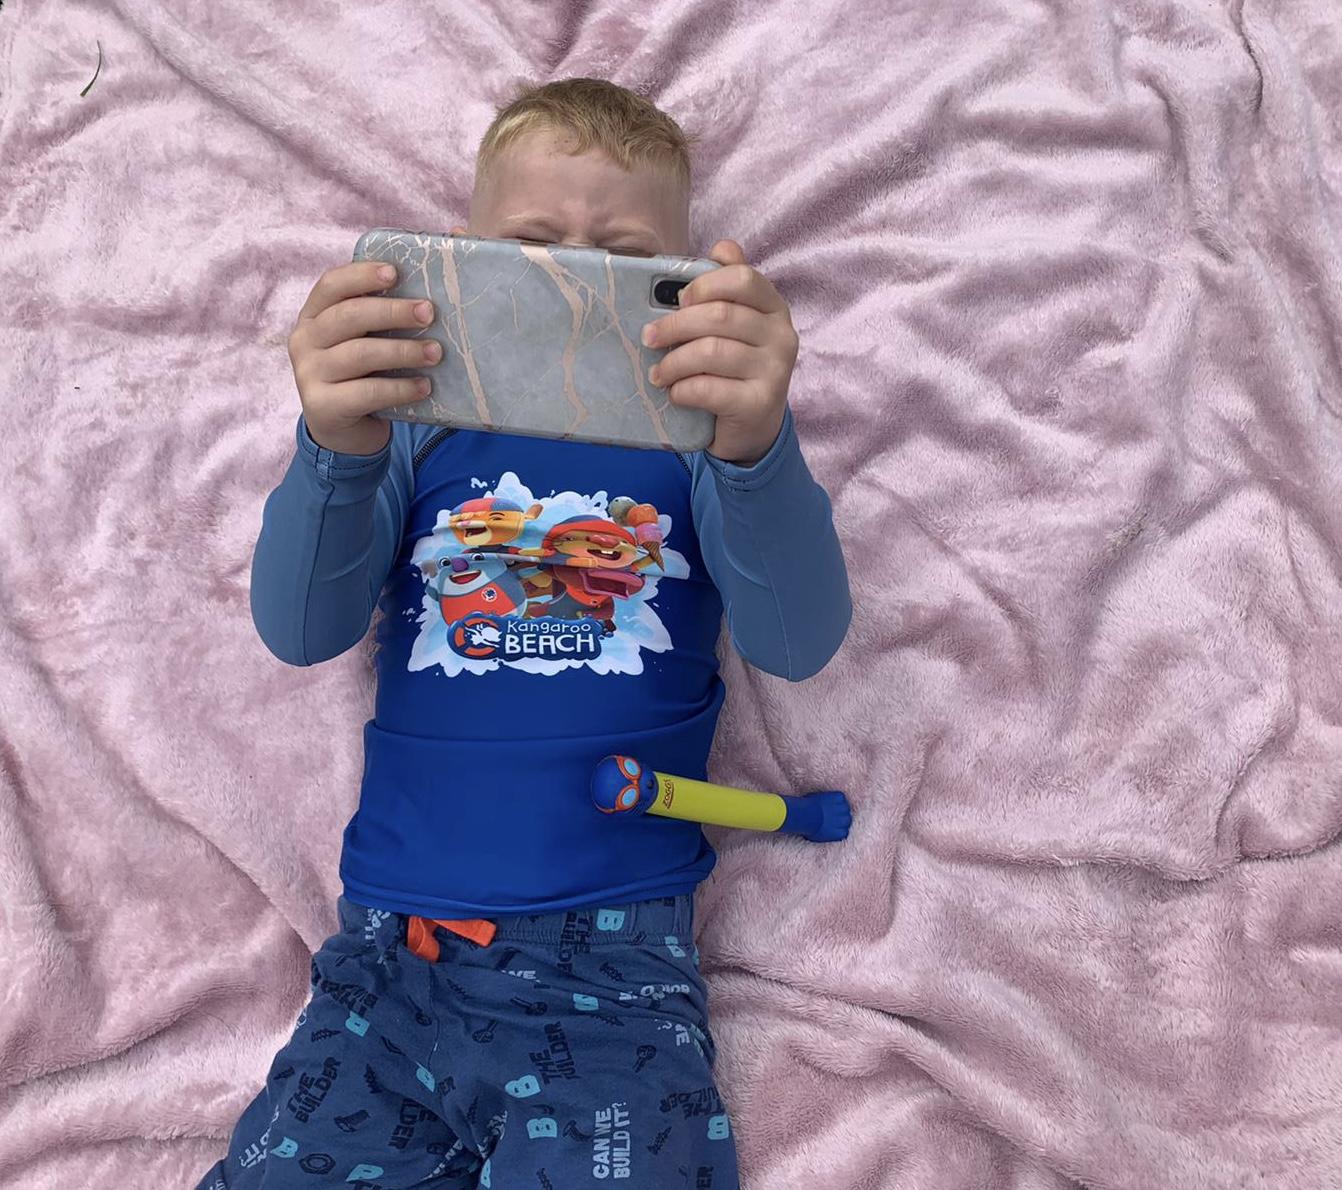 My son watching the phone whilst wearing a Kangaroo Beach rash vest